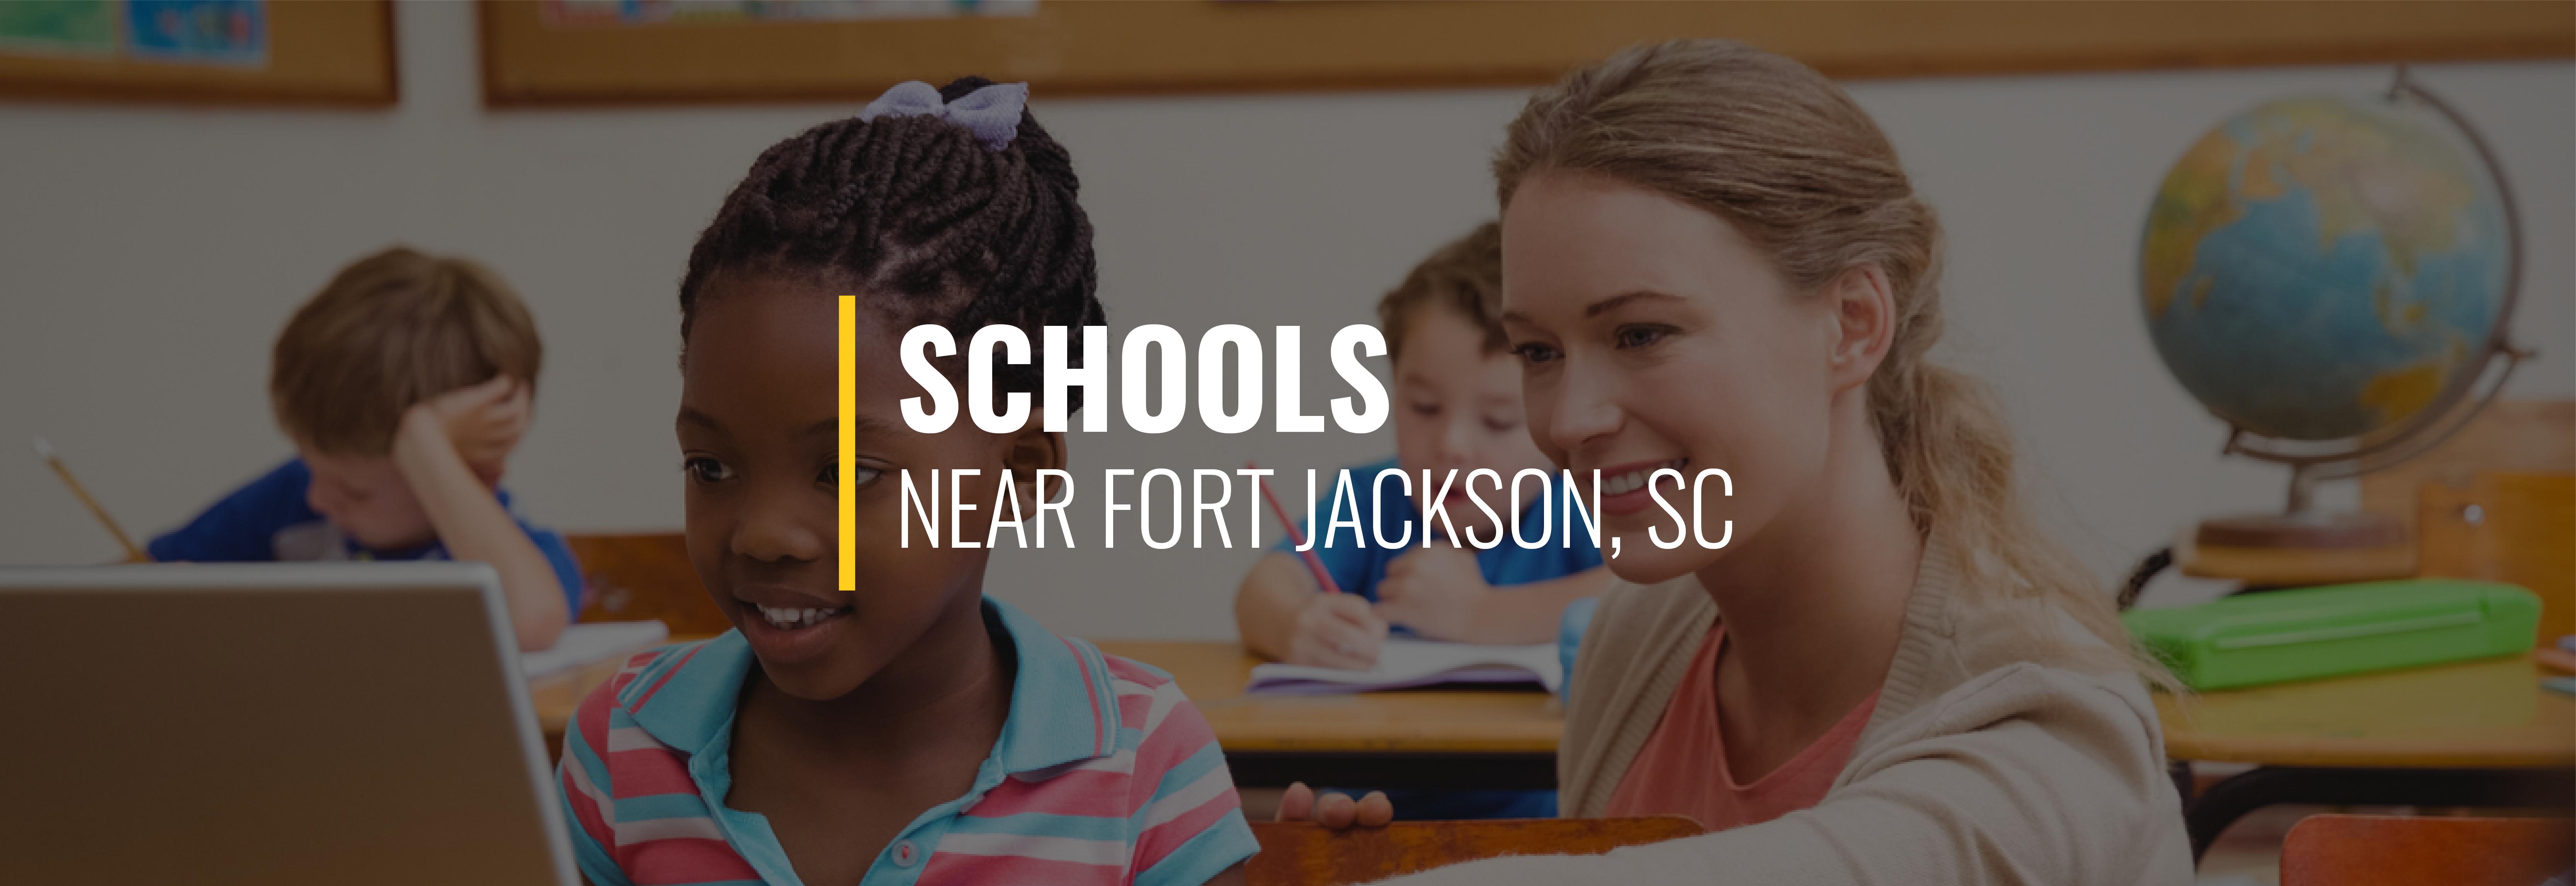 Fort Jackson SC Schools